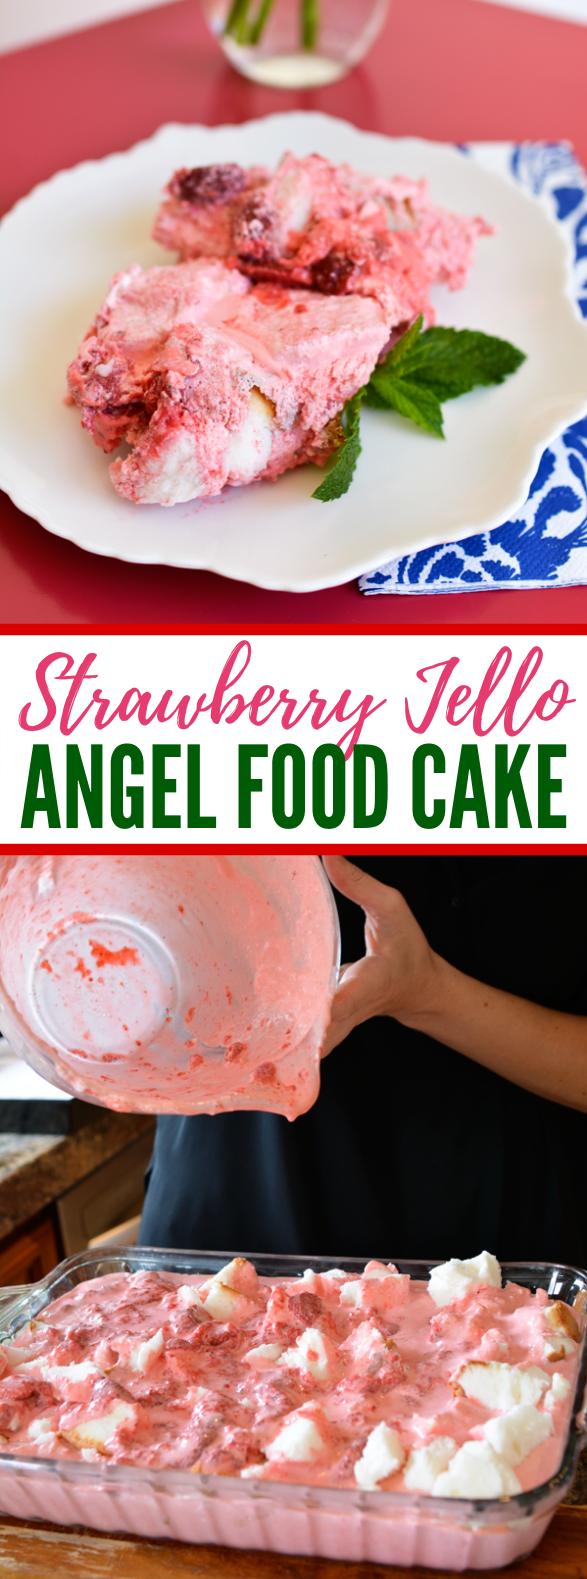 Easy Strawberry, Jello and Angel Food Cake Dessert Recipe #sweets #cake